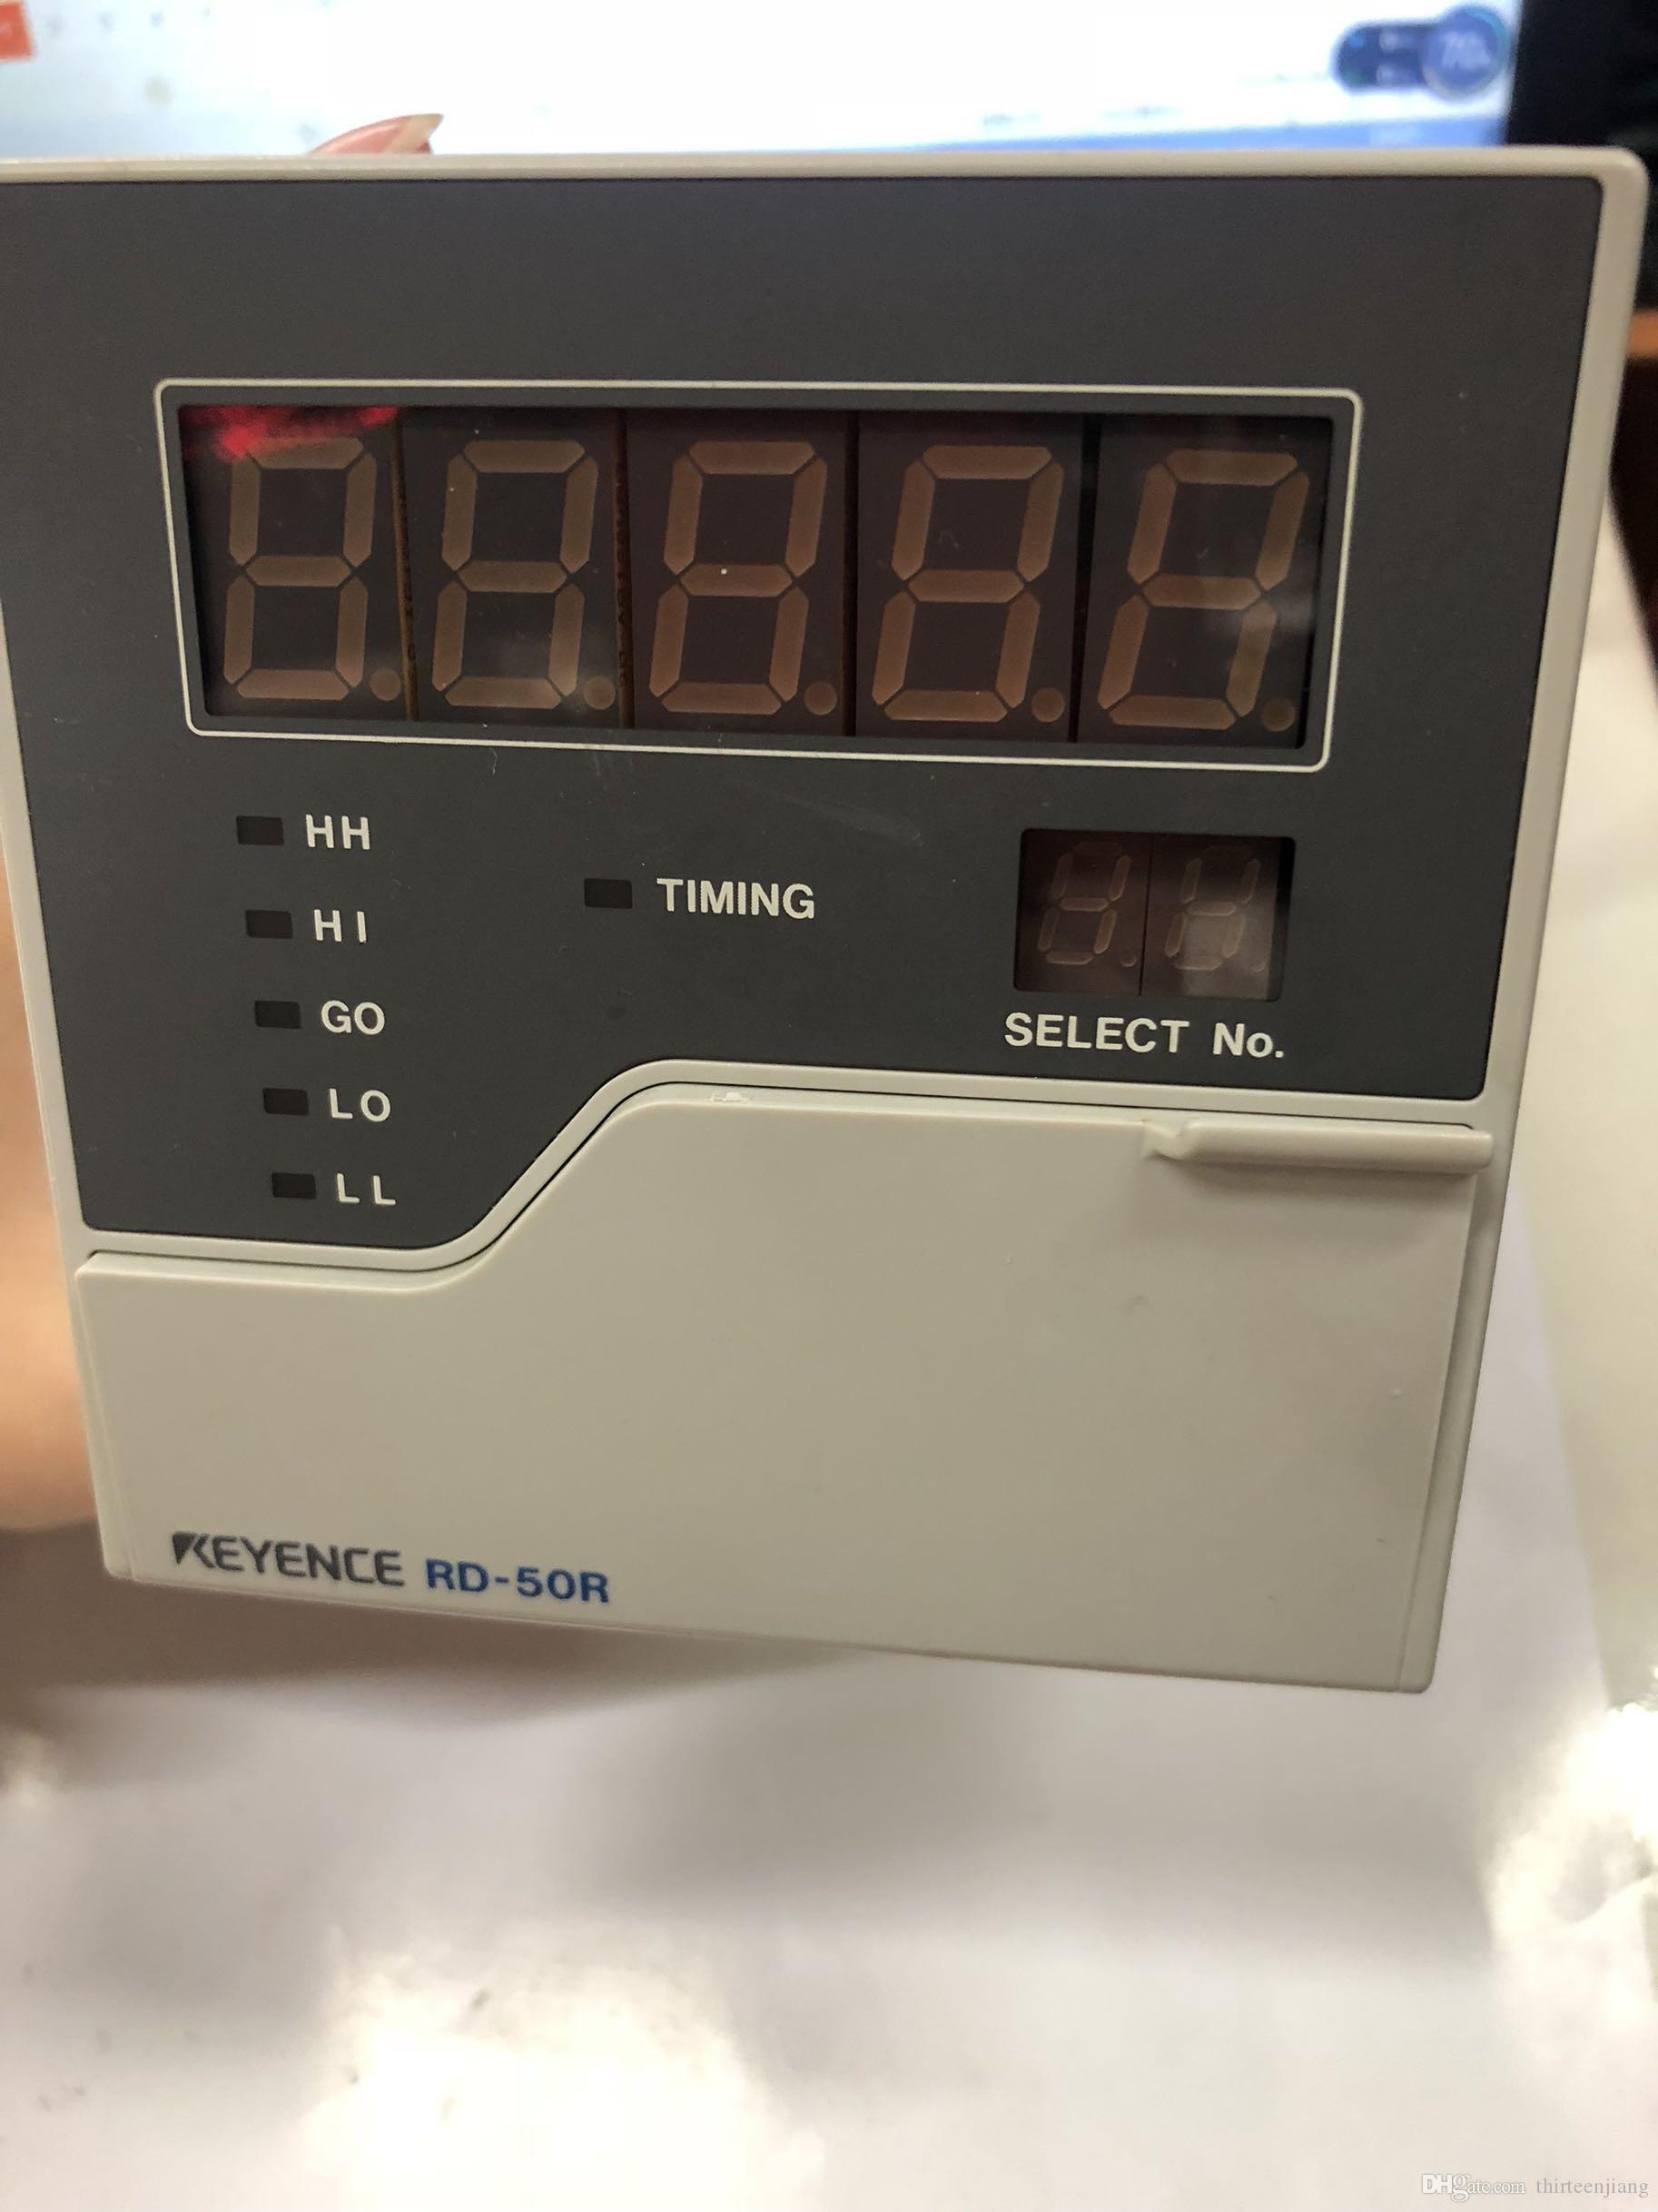 1PCS Keyence RD Series Analog Sensor Controller RD-50R New In Box Free Expedited Shipping